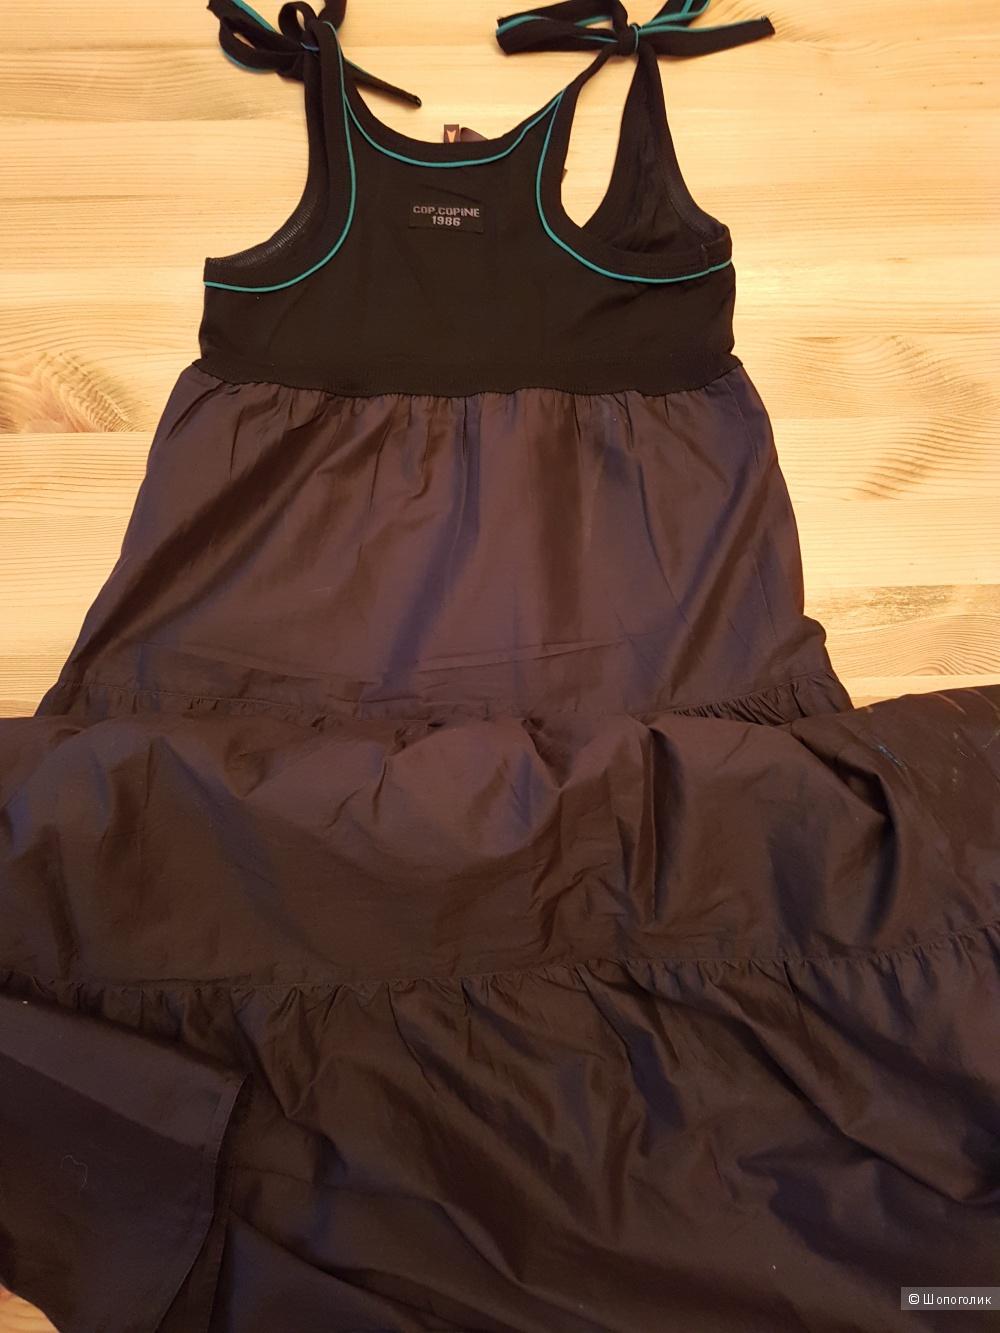 Платье COP.COPINE, размер 42-44